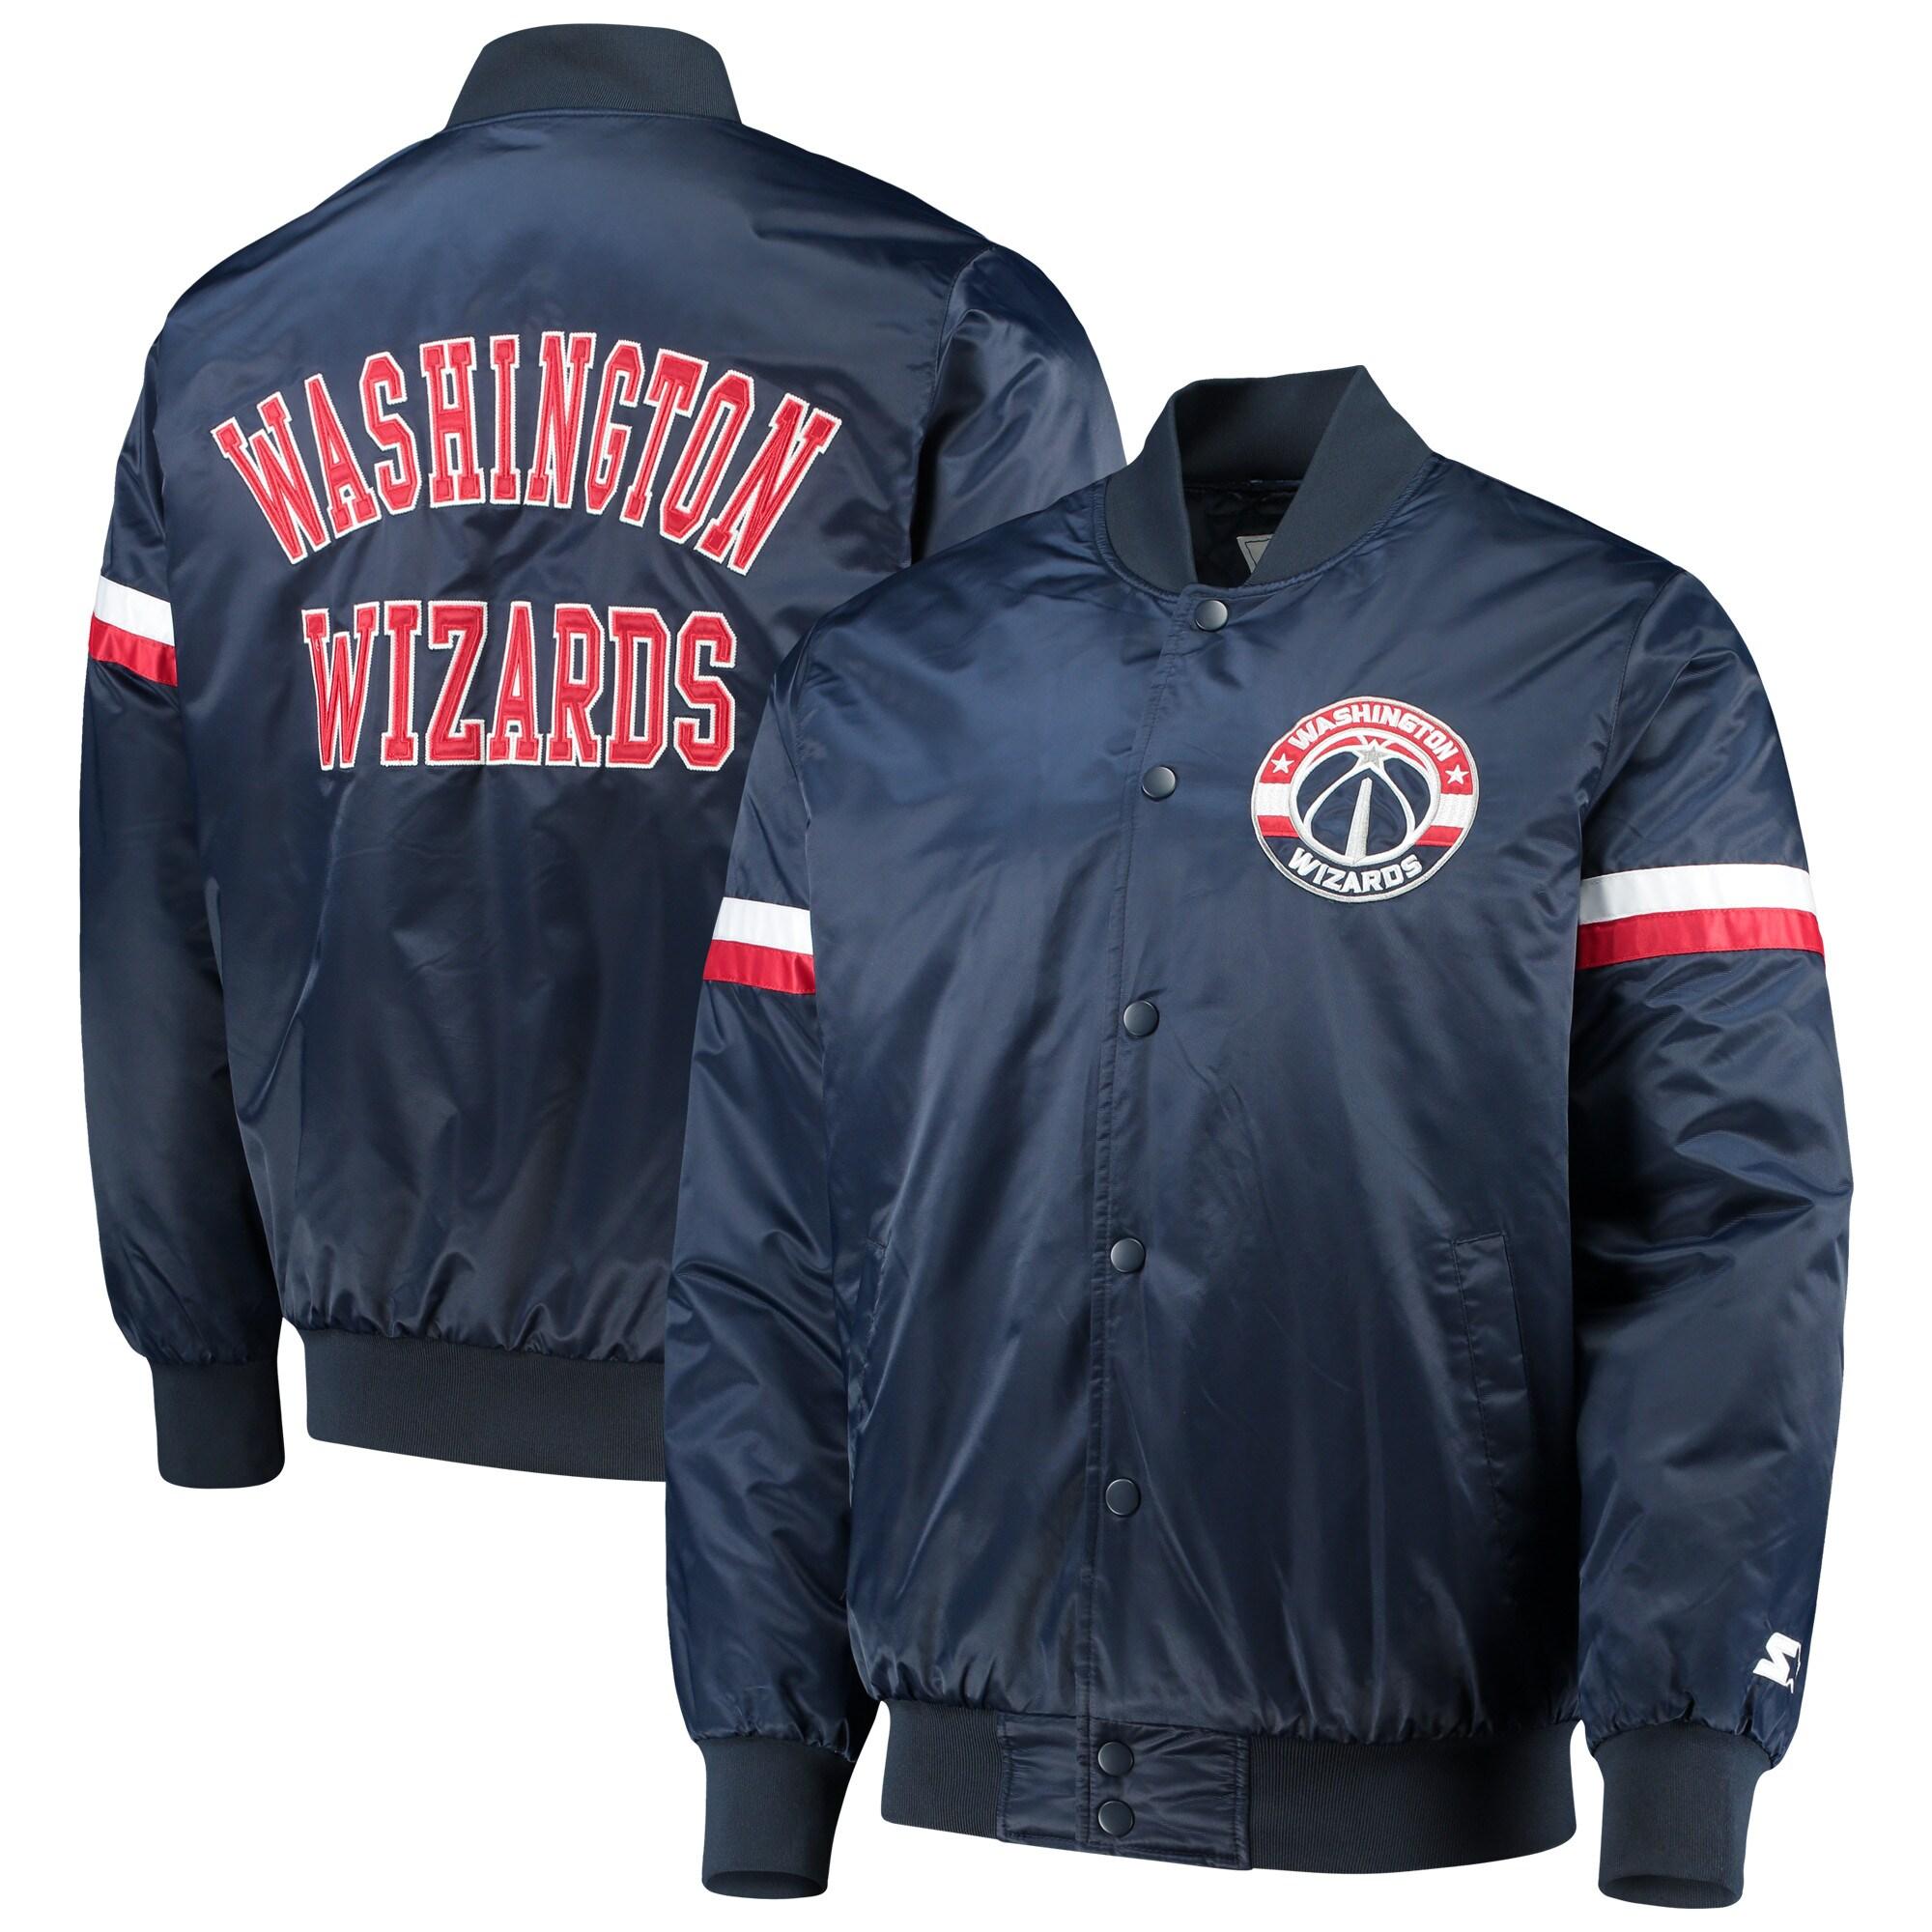 Washington Wizards Starter The Champ Varsity Satin Jacket - Navy